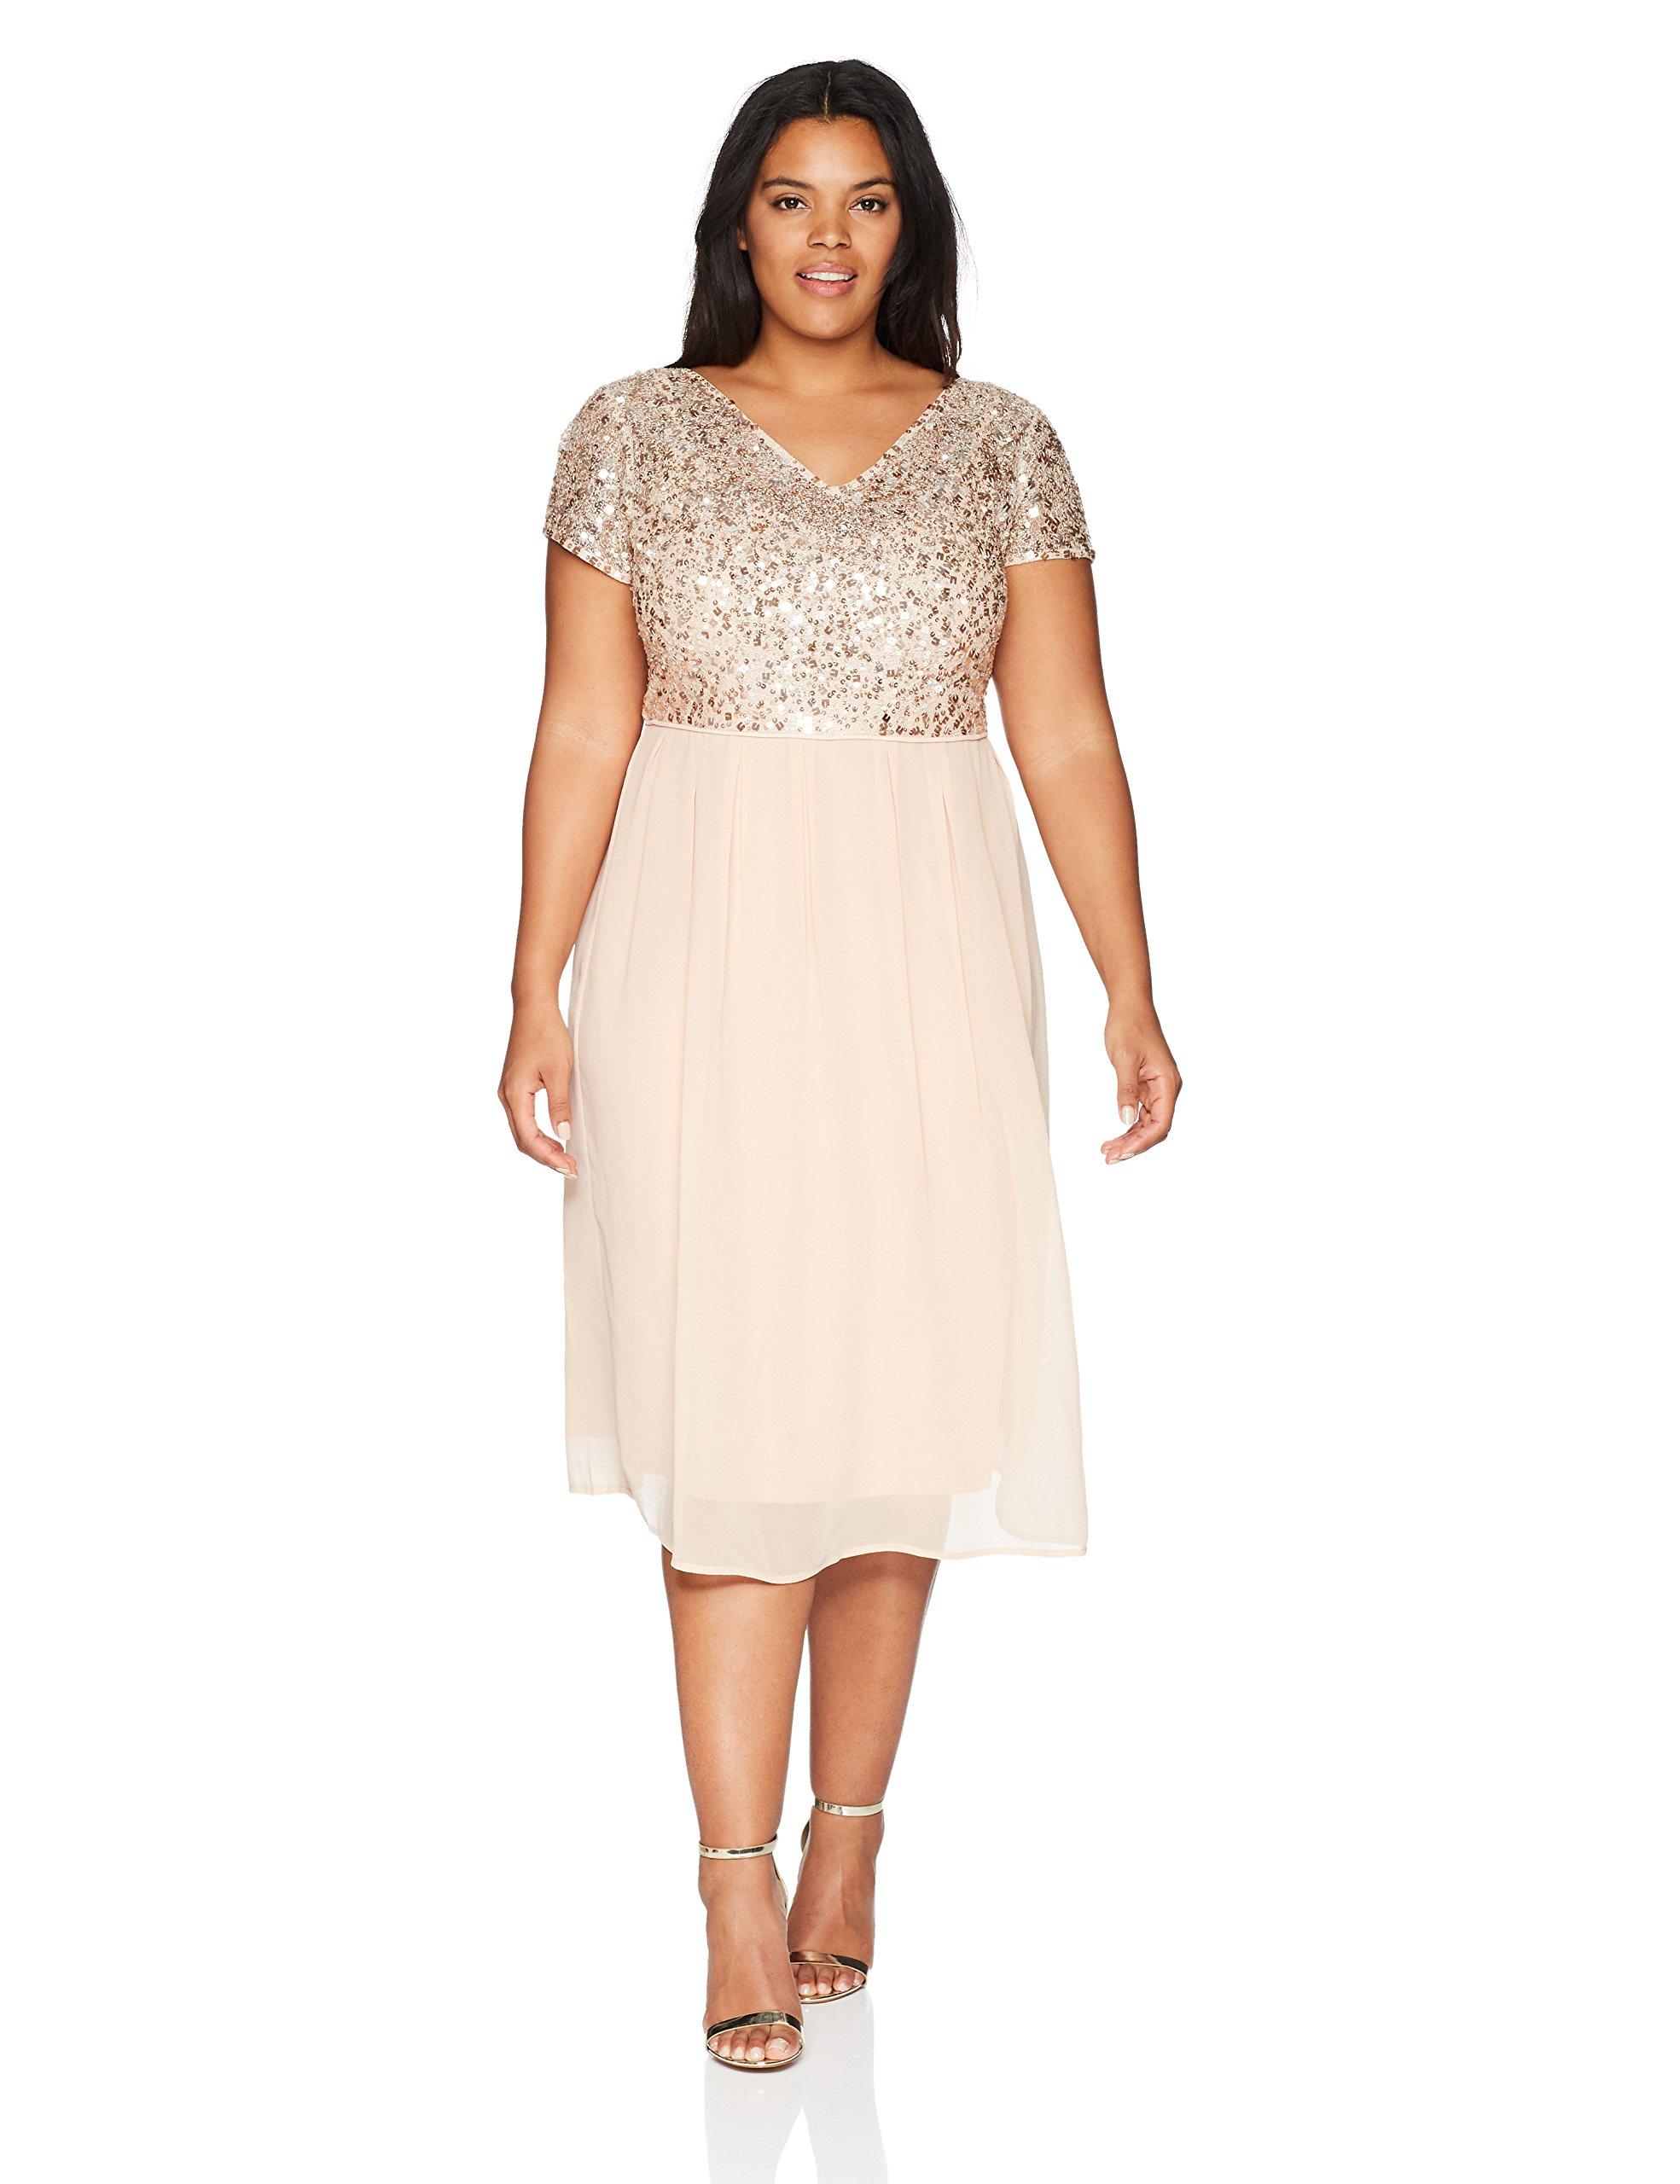 Adrianna Papell Women's Plus Size Tea Length Beaded Dress With Metallic Mesh Bodice, English Rose, 22W